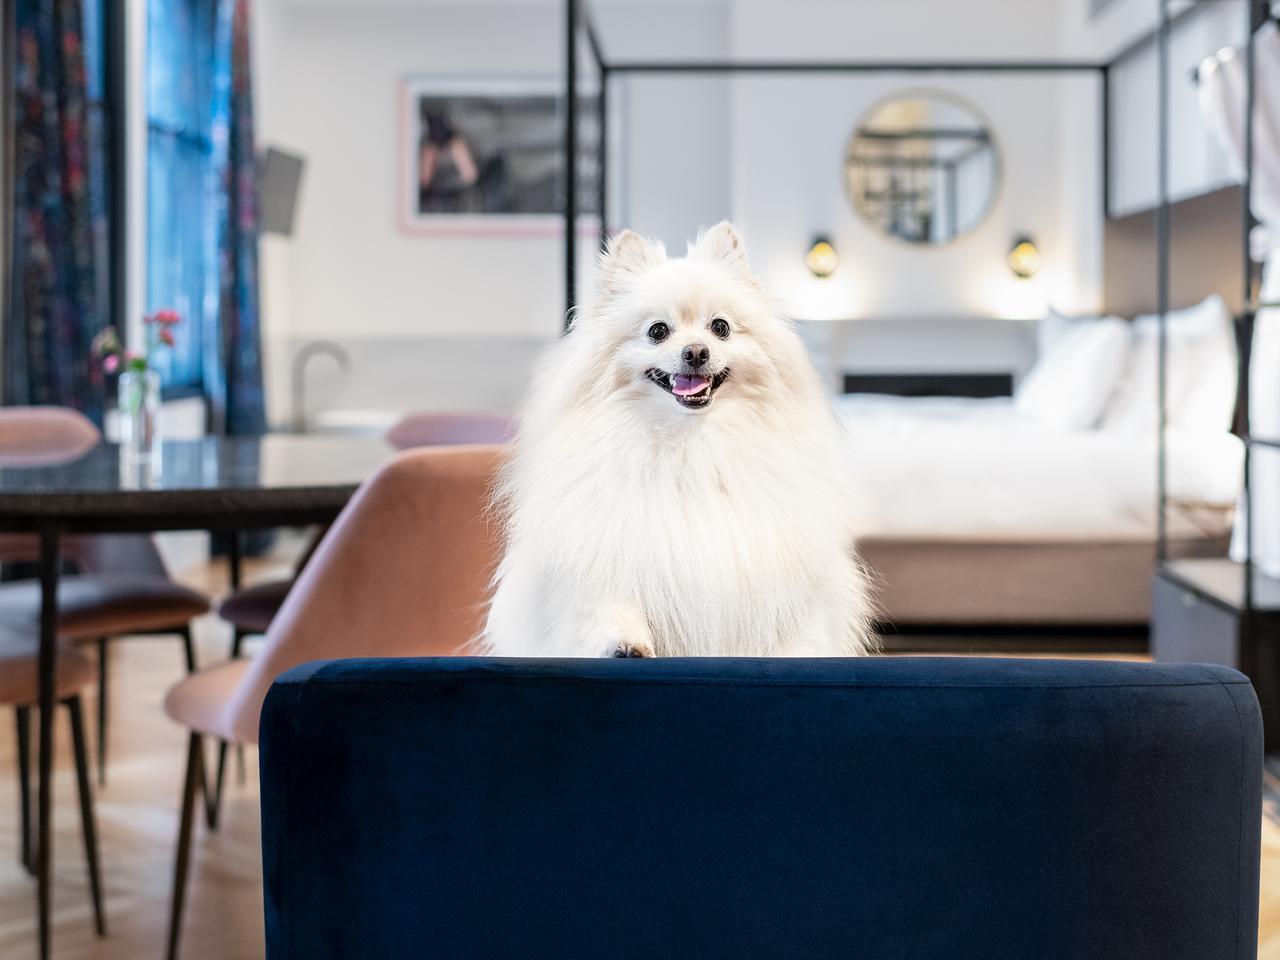 Pet-friendly accomodation at Litlle Albion, Sydney.